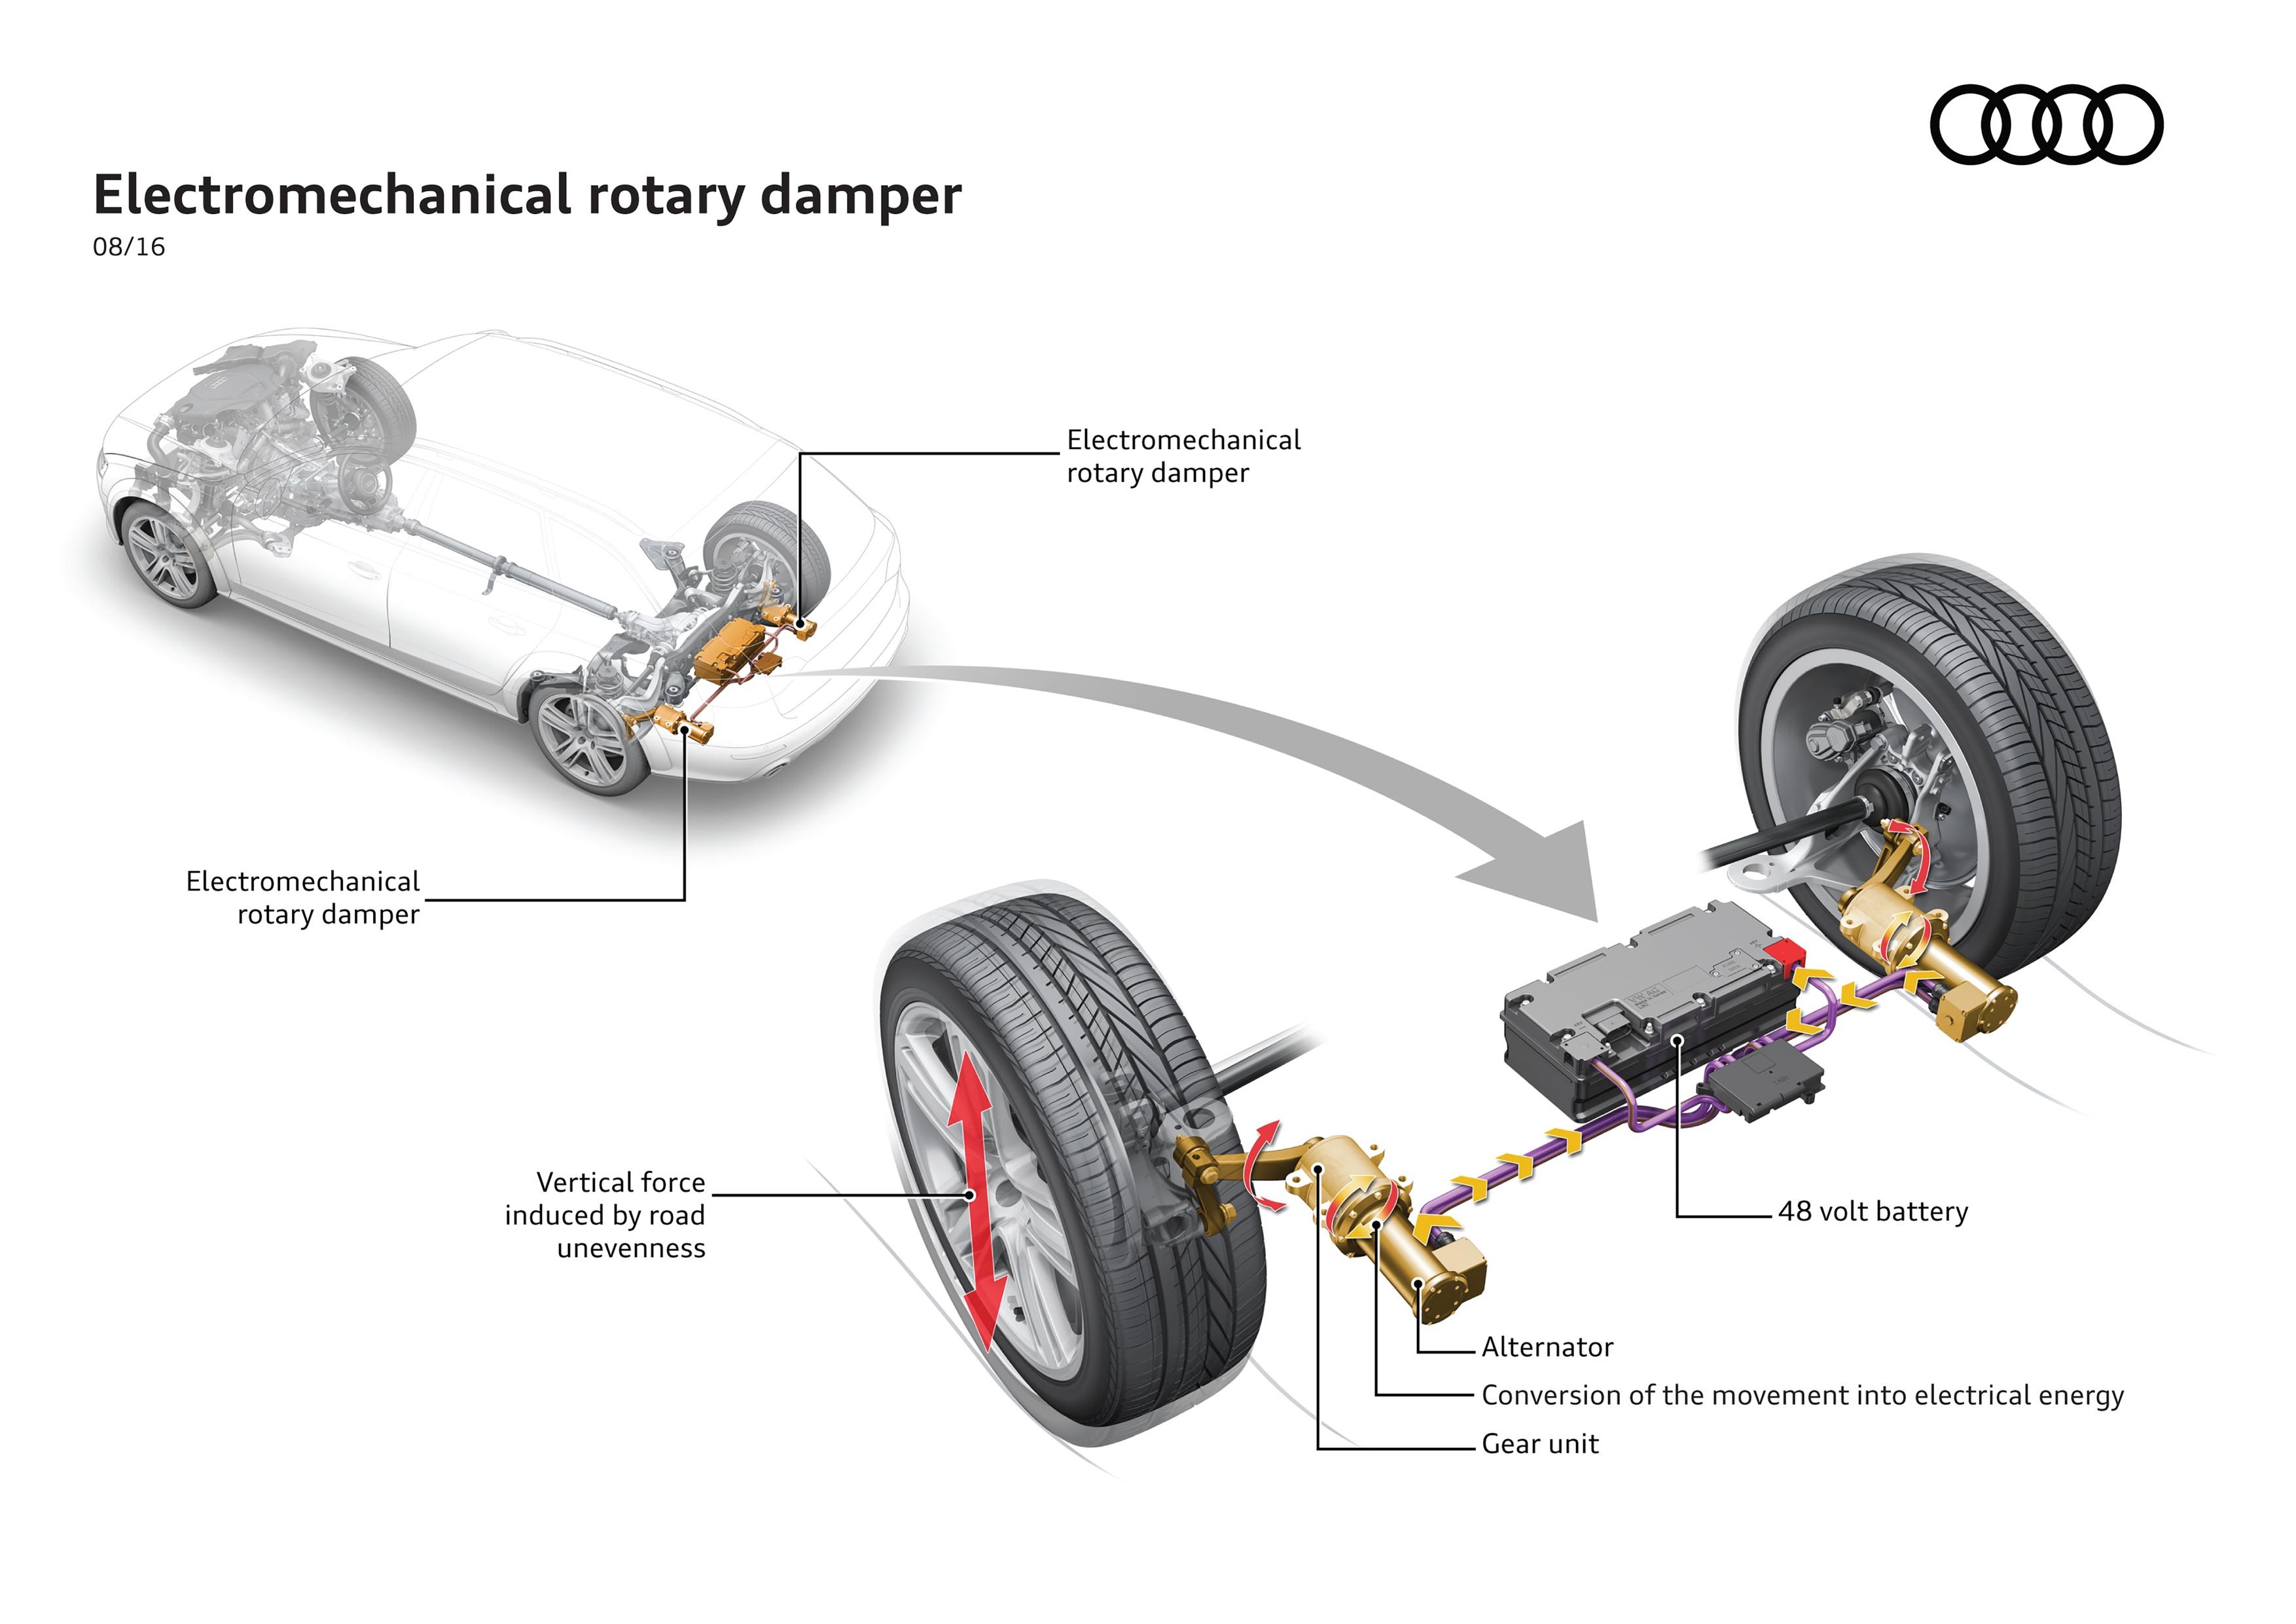 Audi Electromechanical rotary damper| Source: Audi